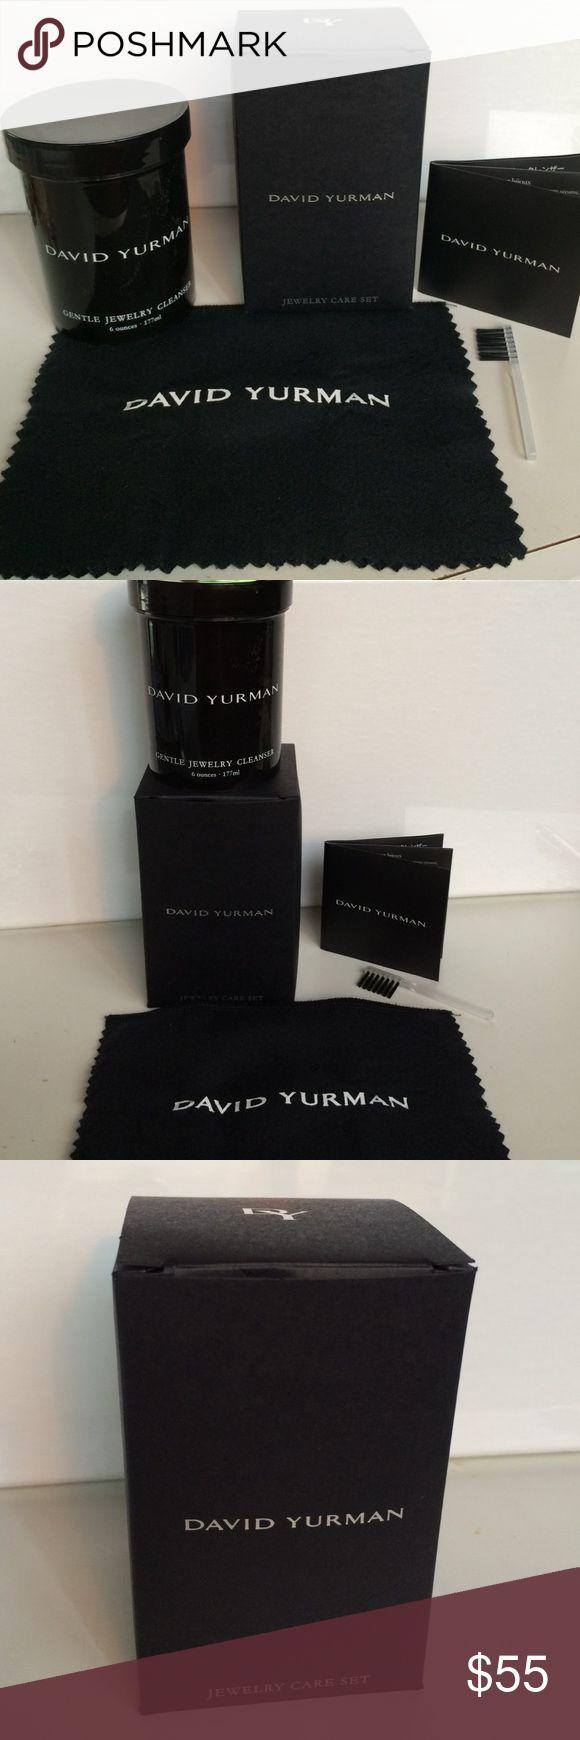 David Yurman Cleaning Solution